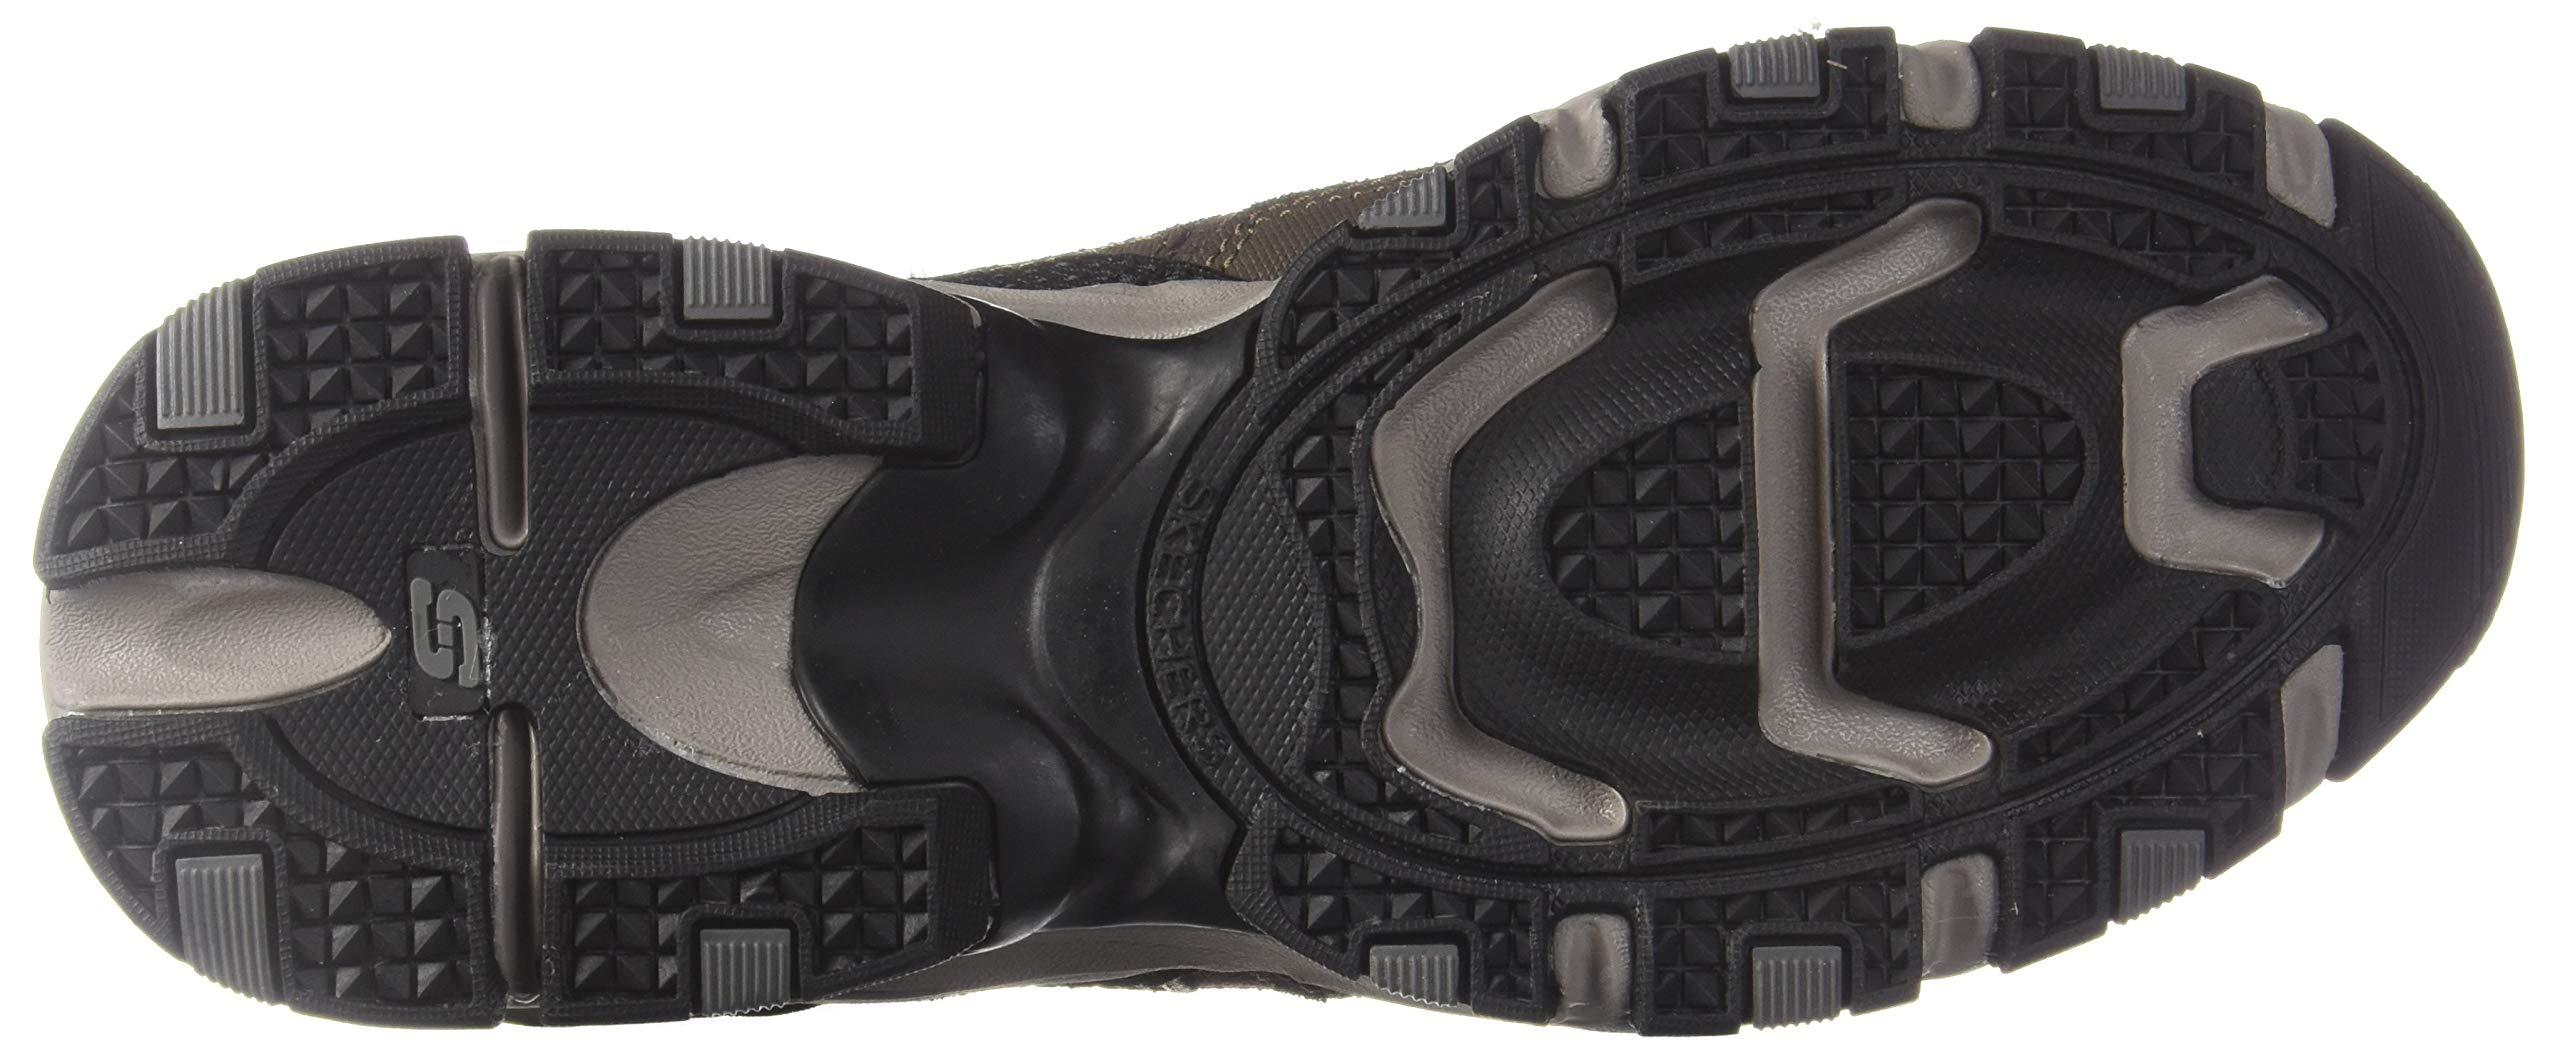 Skechers Sport Men's Vigor 2.0 Trait Memory Foam Sneaker, Brown/Black, 7 M US by Skechers (Image #3)